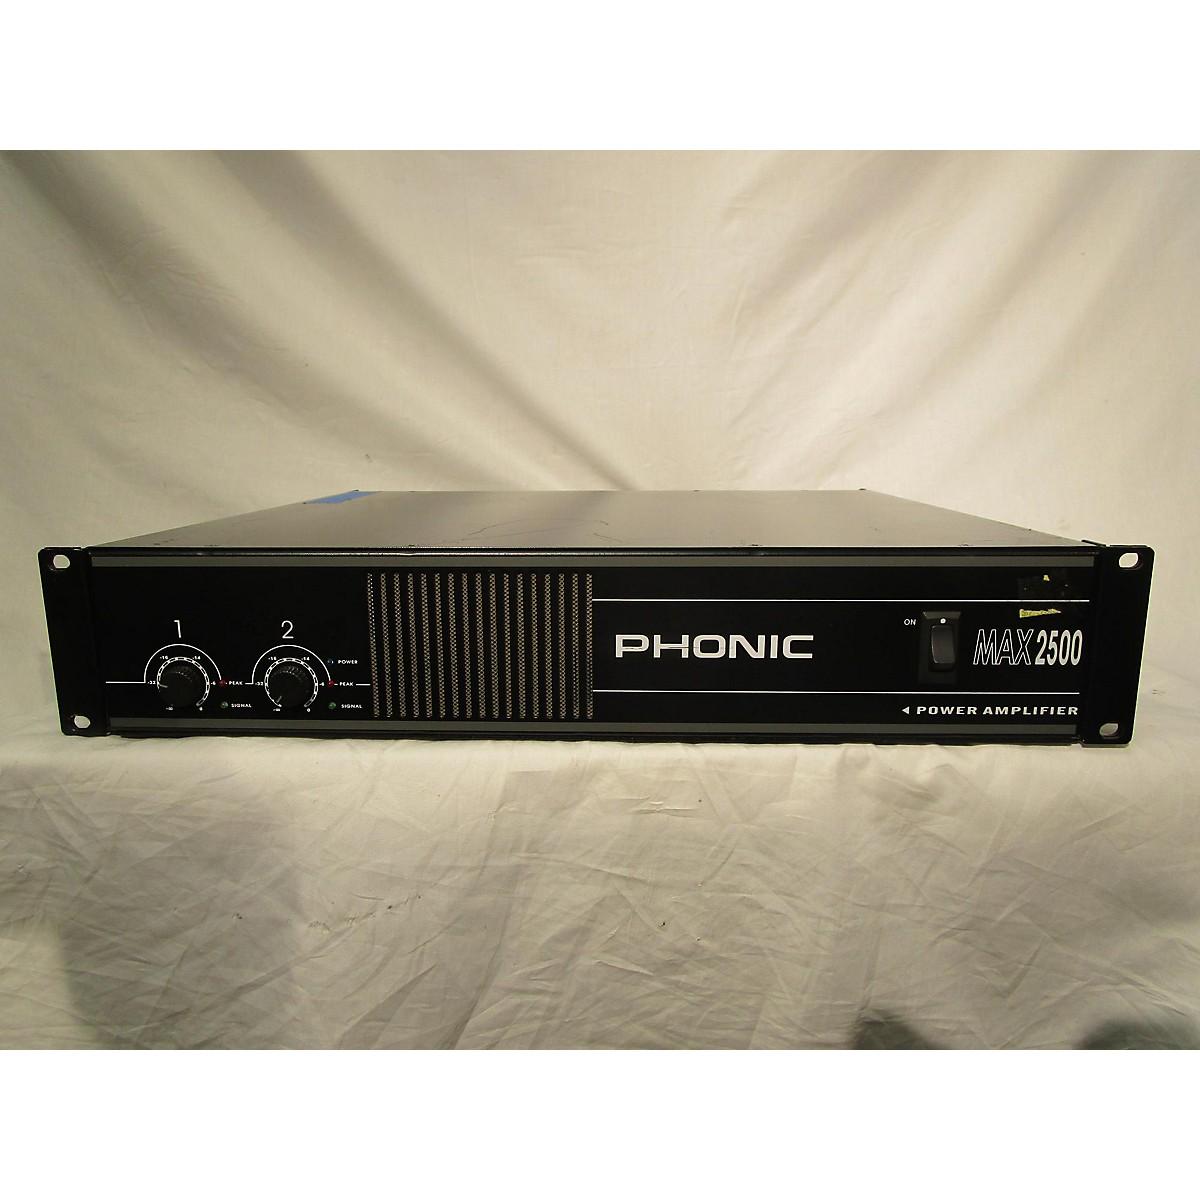 Phonic MX 2500 Keyboard Amp